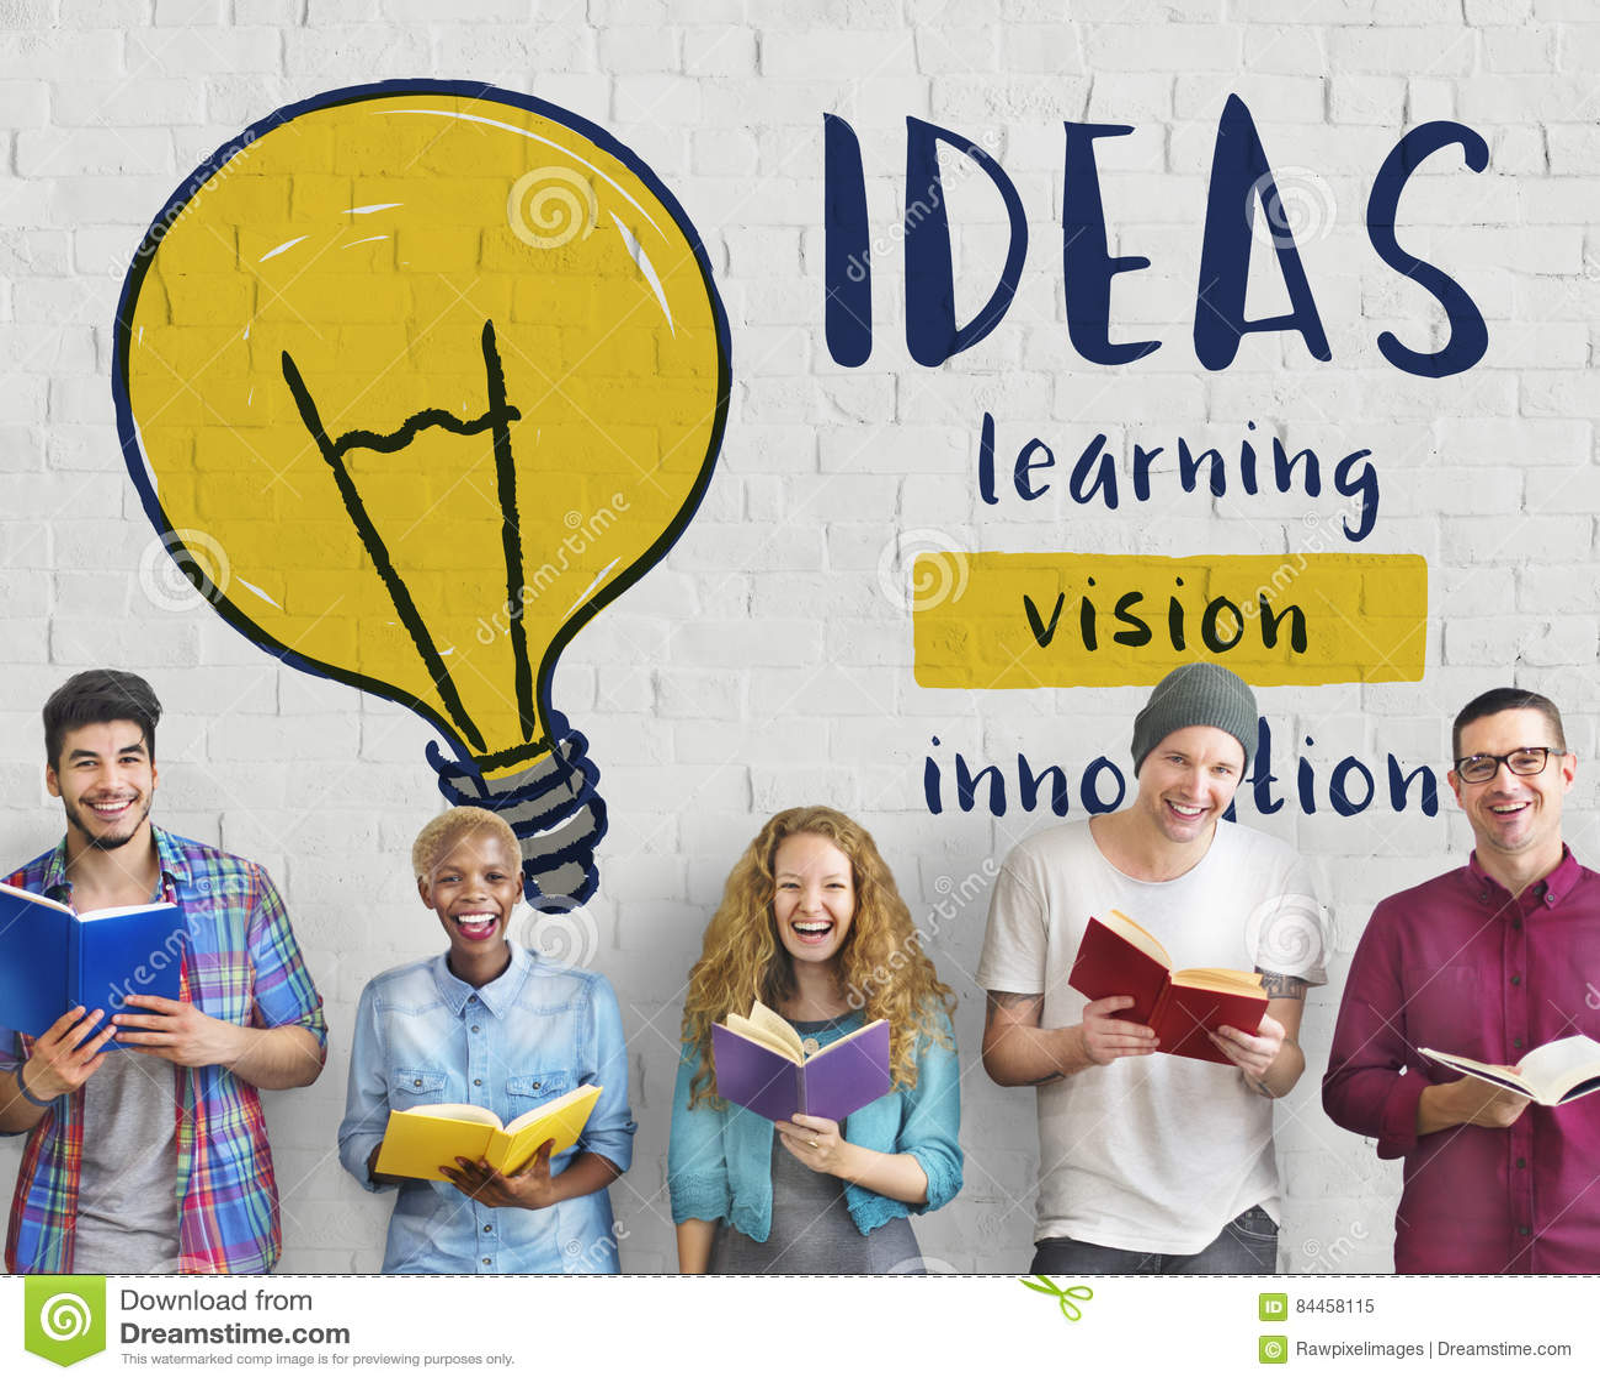 Homework help on creativity in business